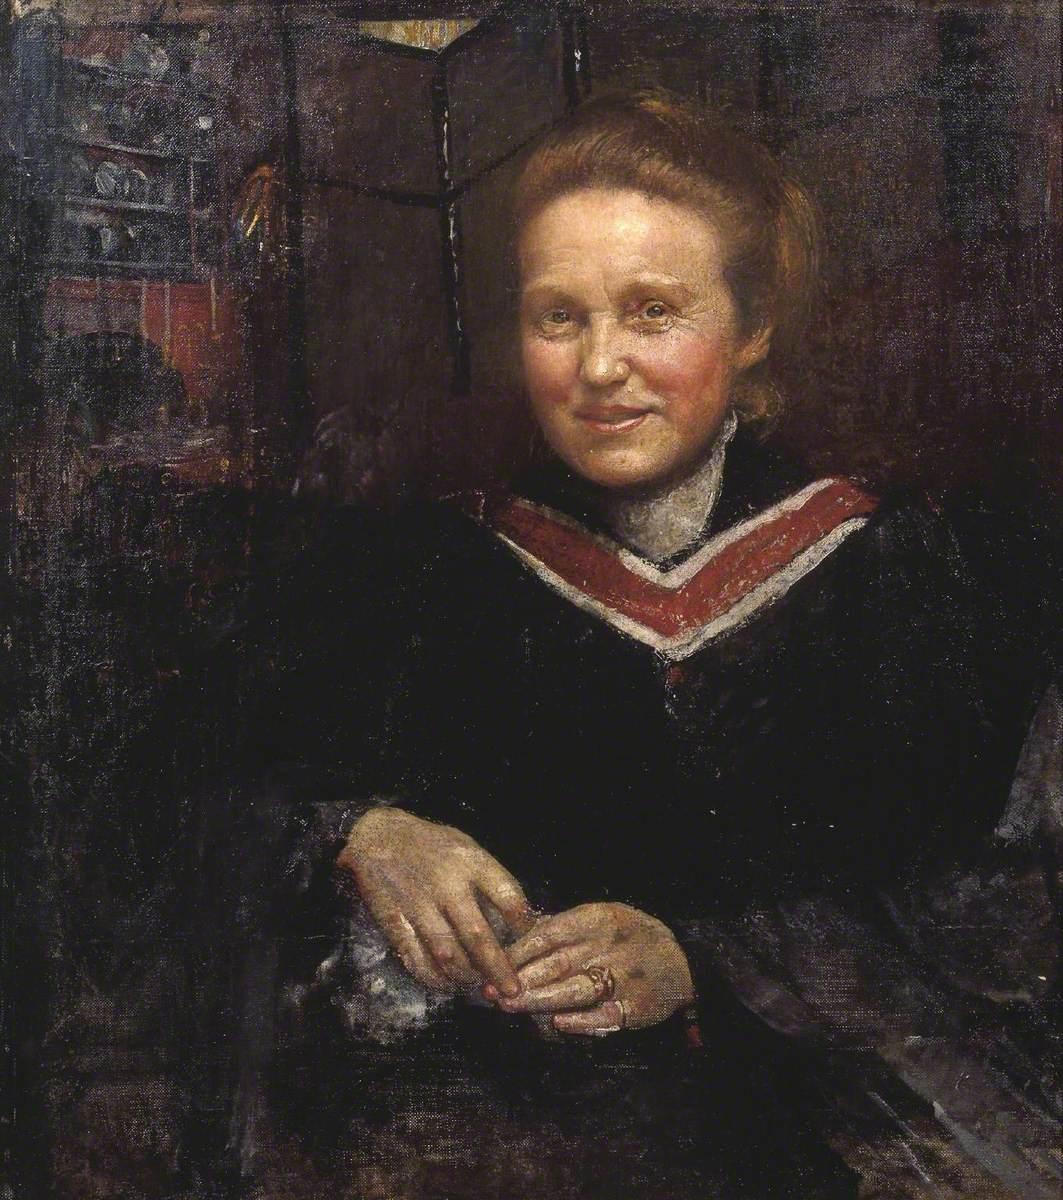 Dame Millicent Fawcett, GBE, LLD